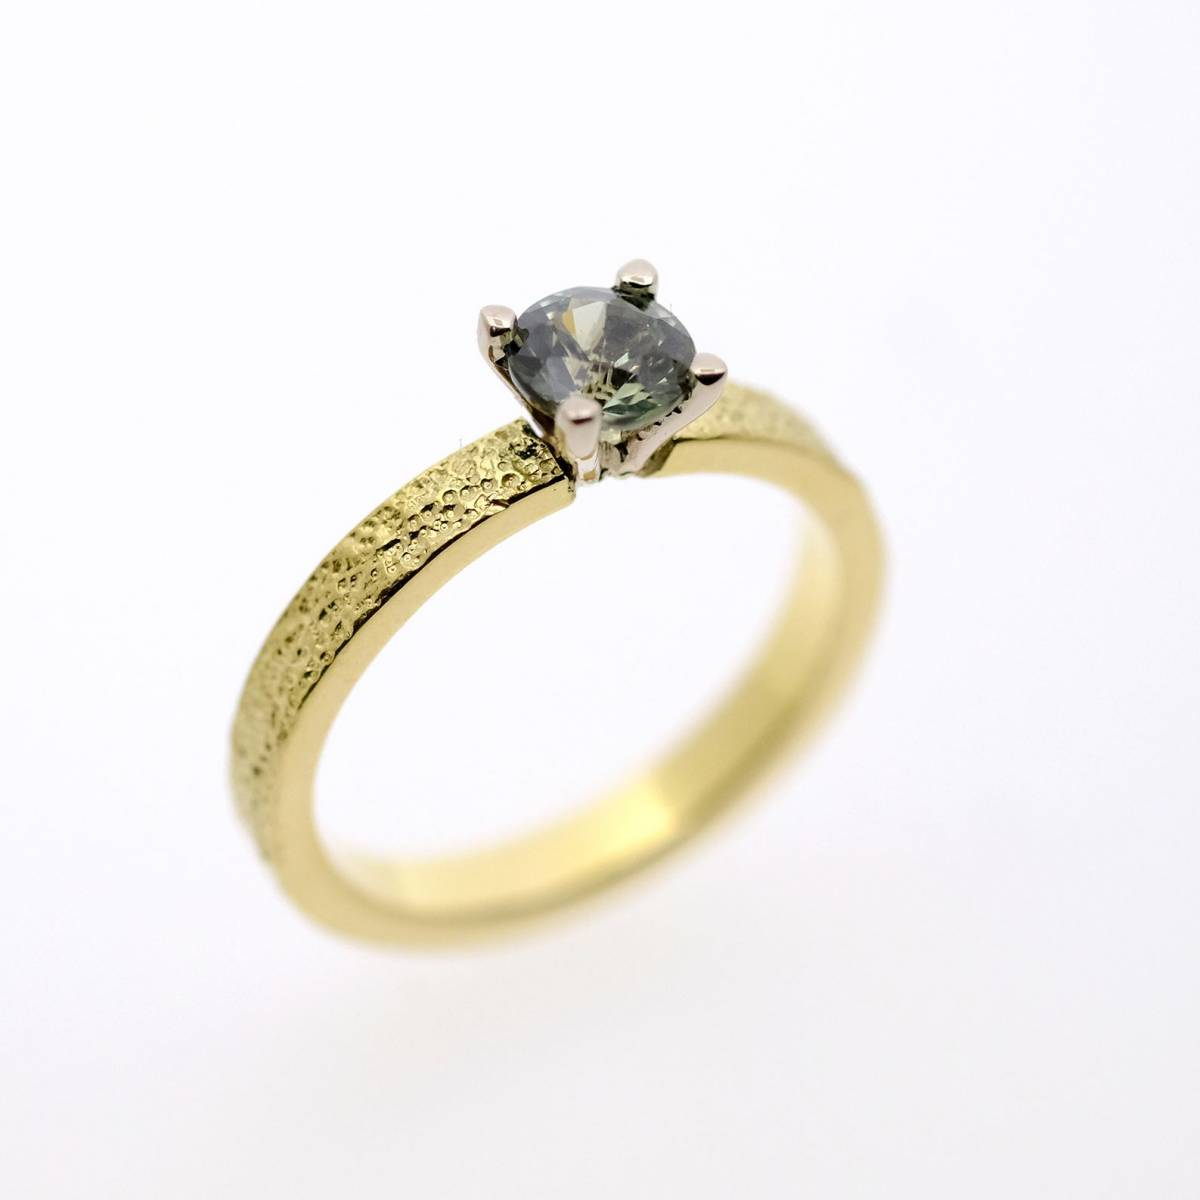 Jonas Maes Jewels - Juwelen - Bruidsjuwelen - Verlovingsring - Trouwring - House of Weddings - 29